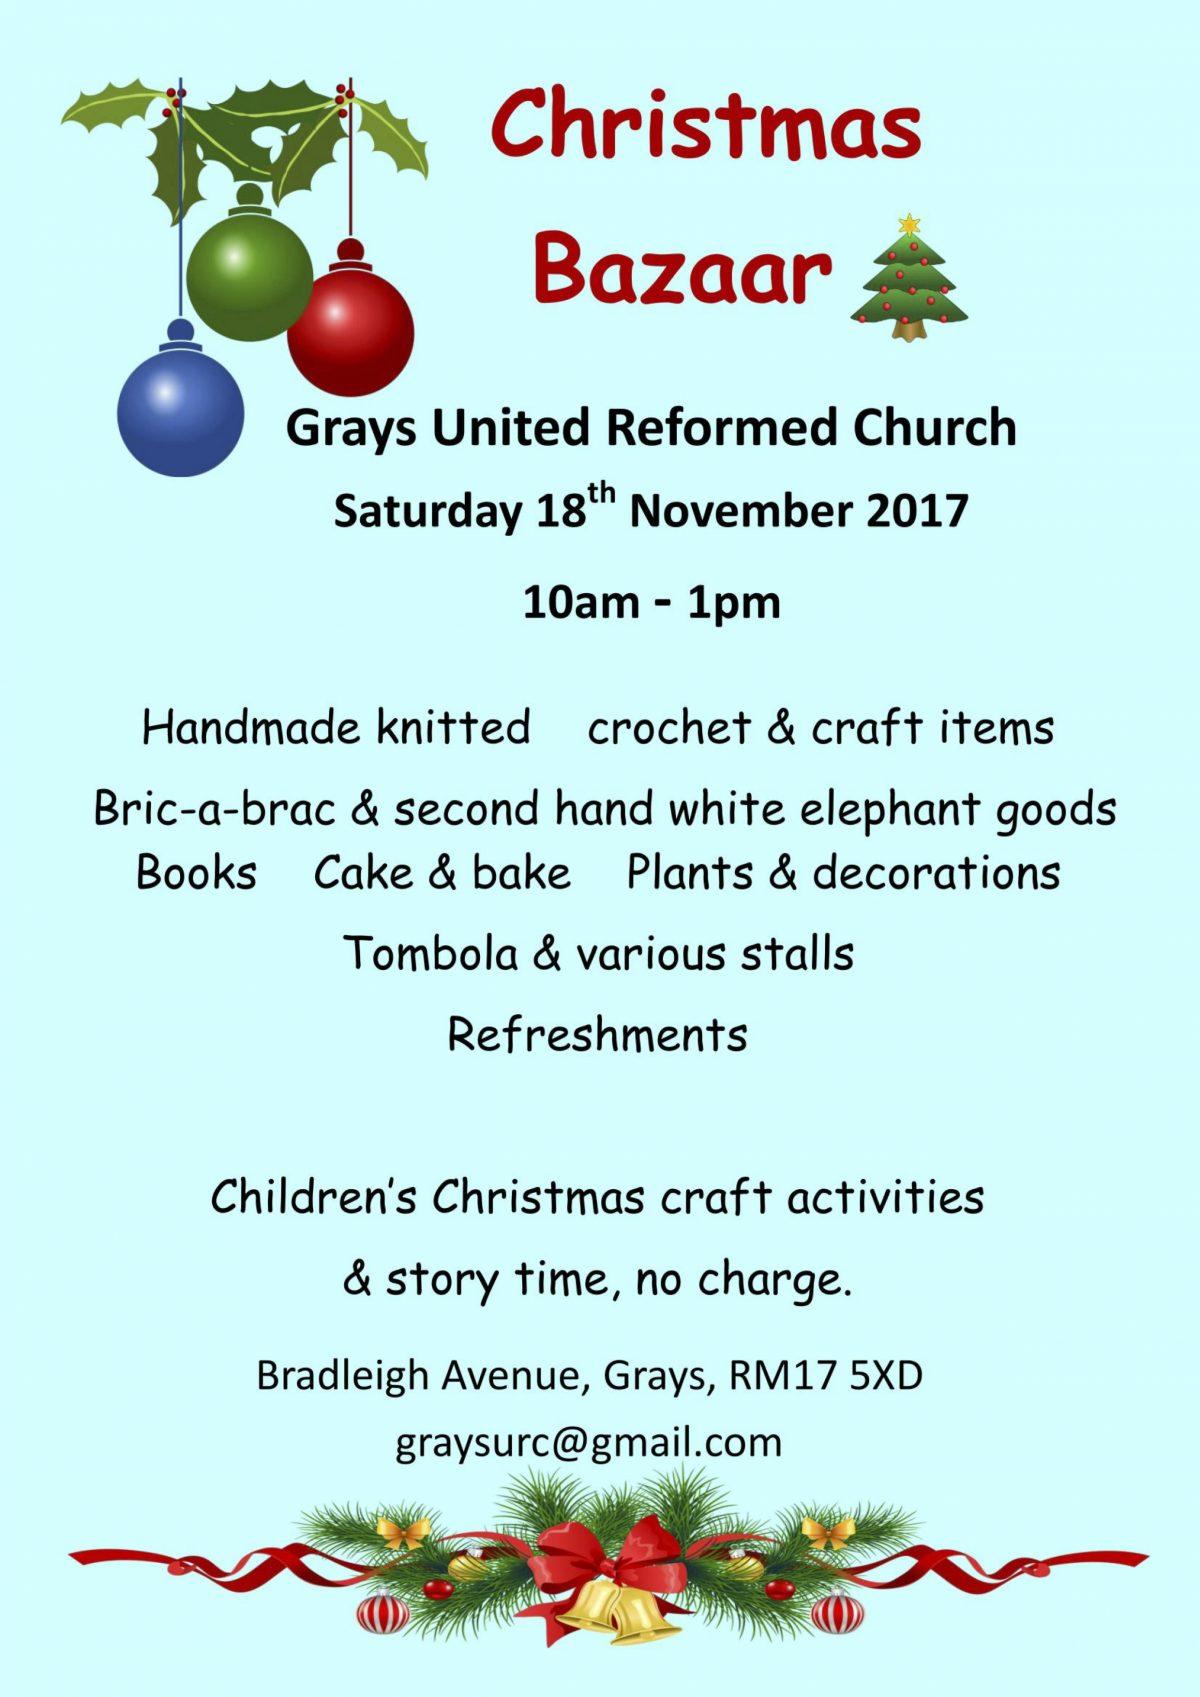 Christmas Bazaar Grays URC